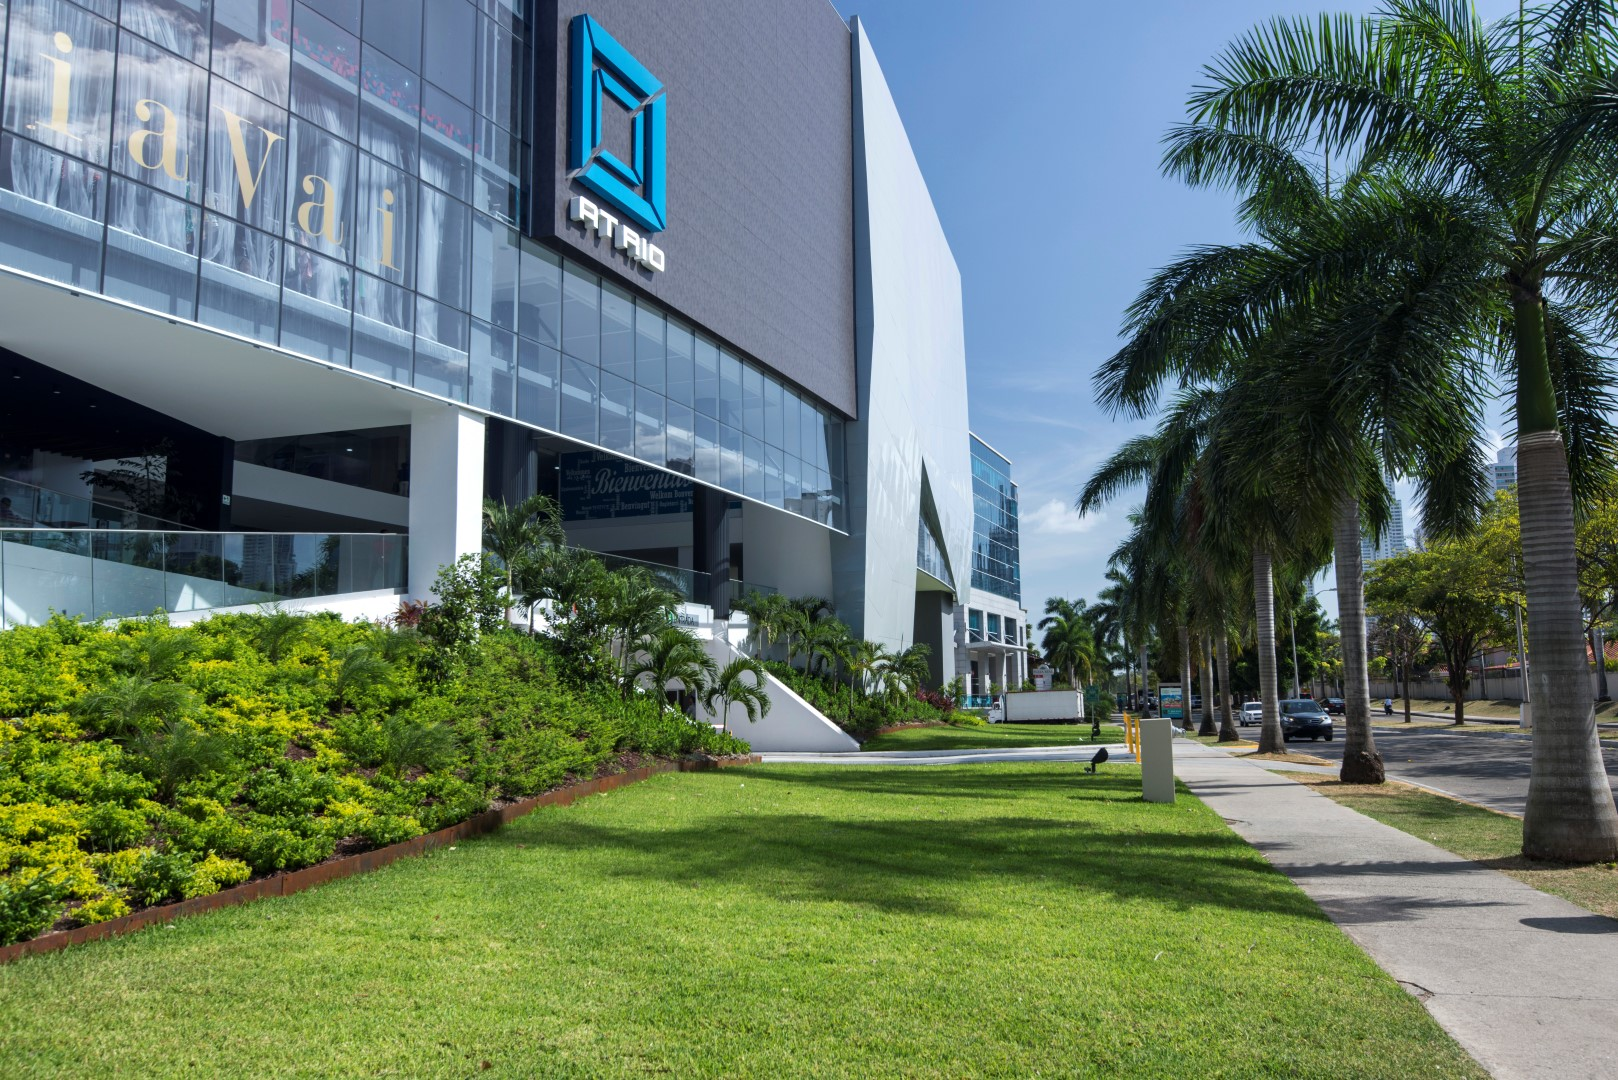 Atrio Mall, Costa del Este,  Panamá.